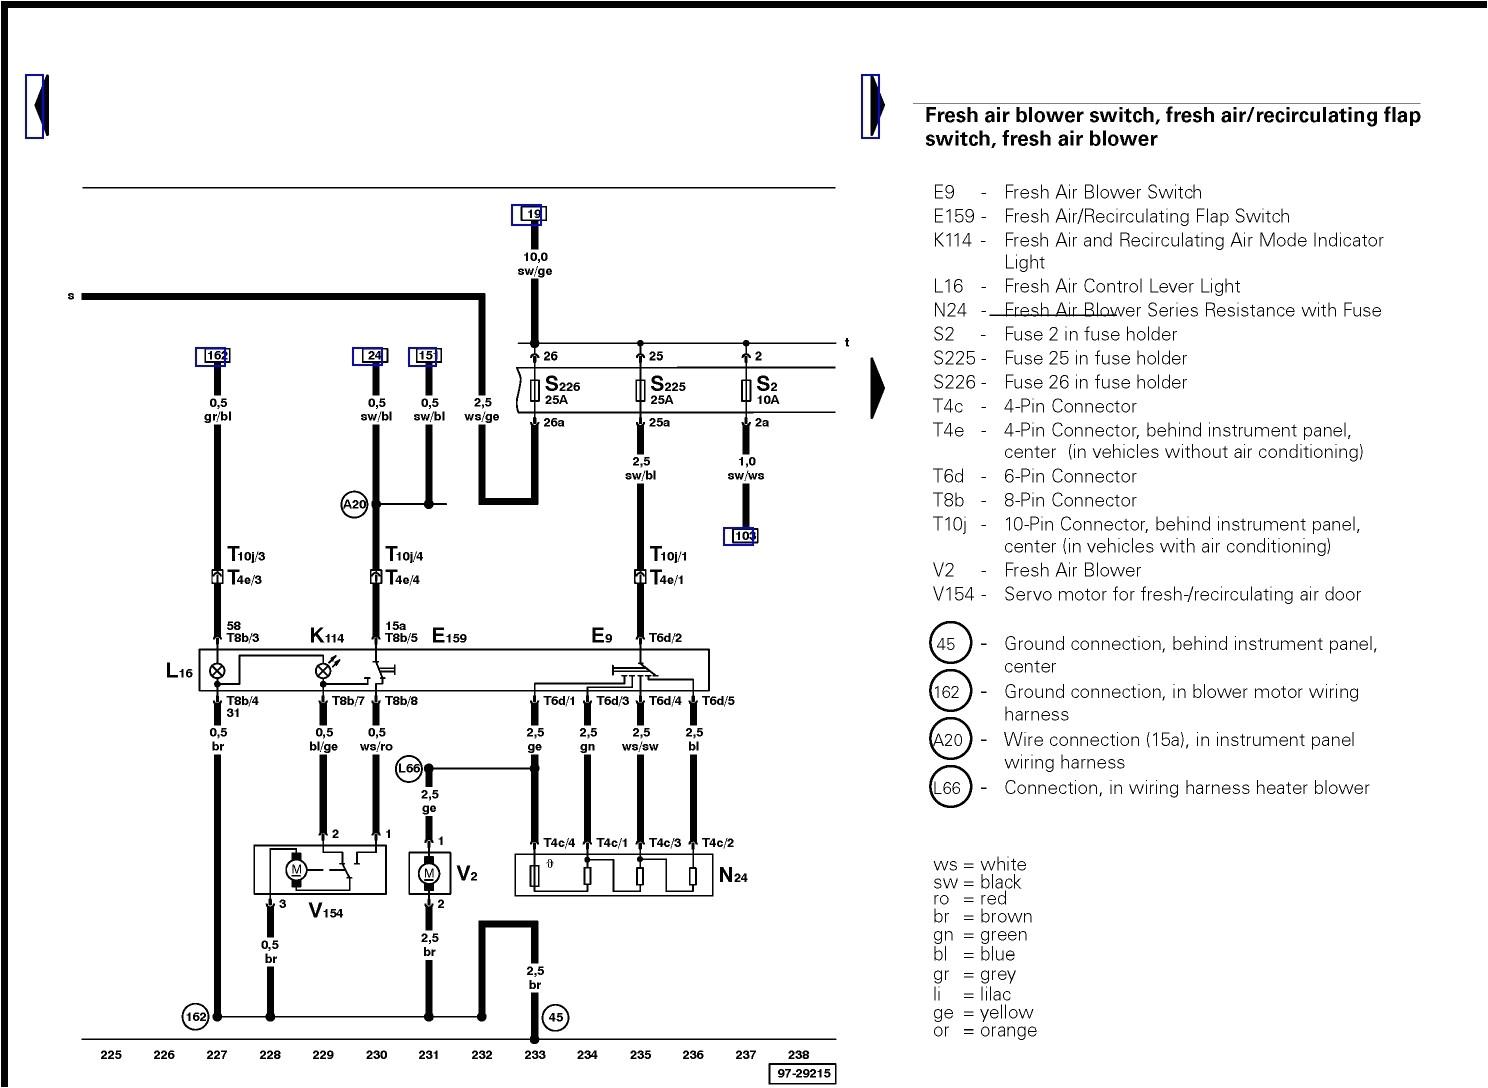 2002 vw jetta wiring diagram wiring diagram2002 vw jetta wiring diagram